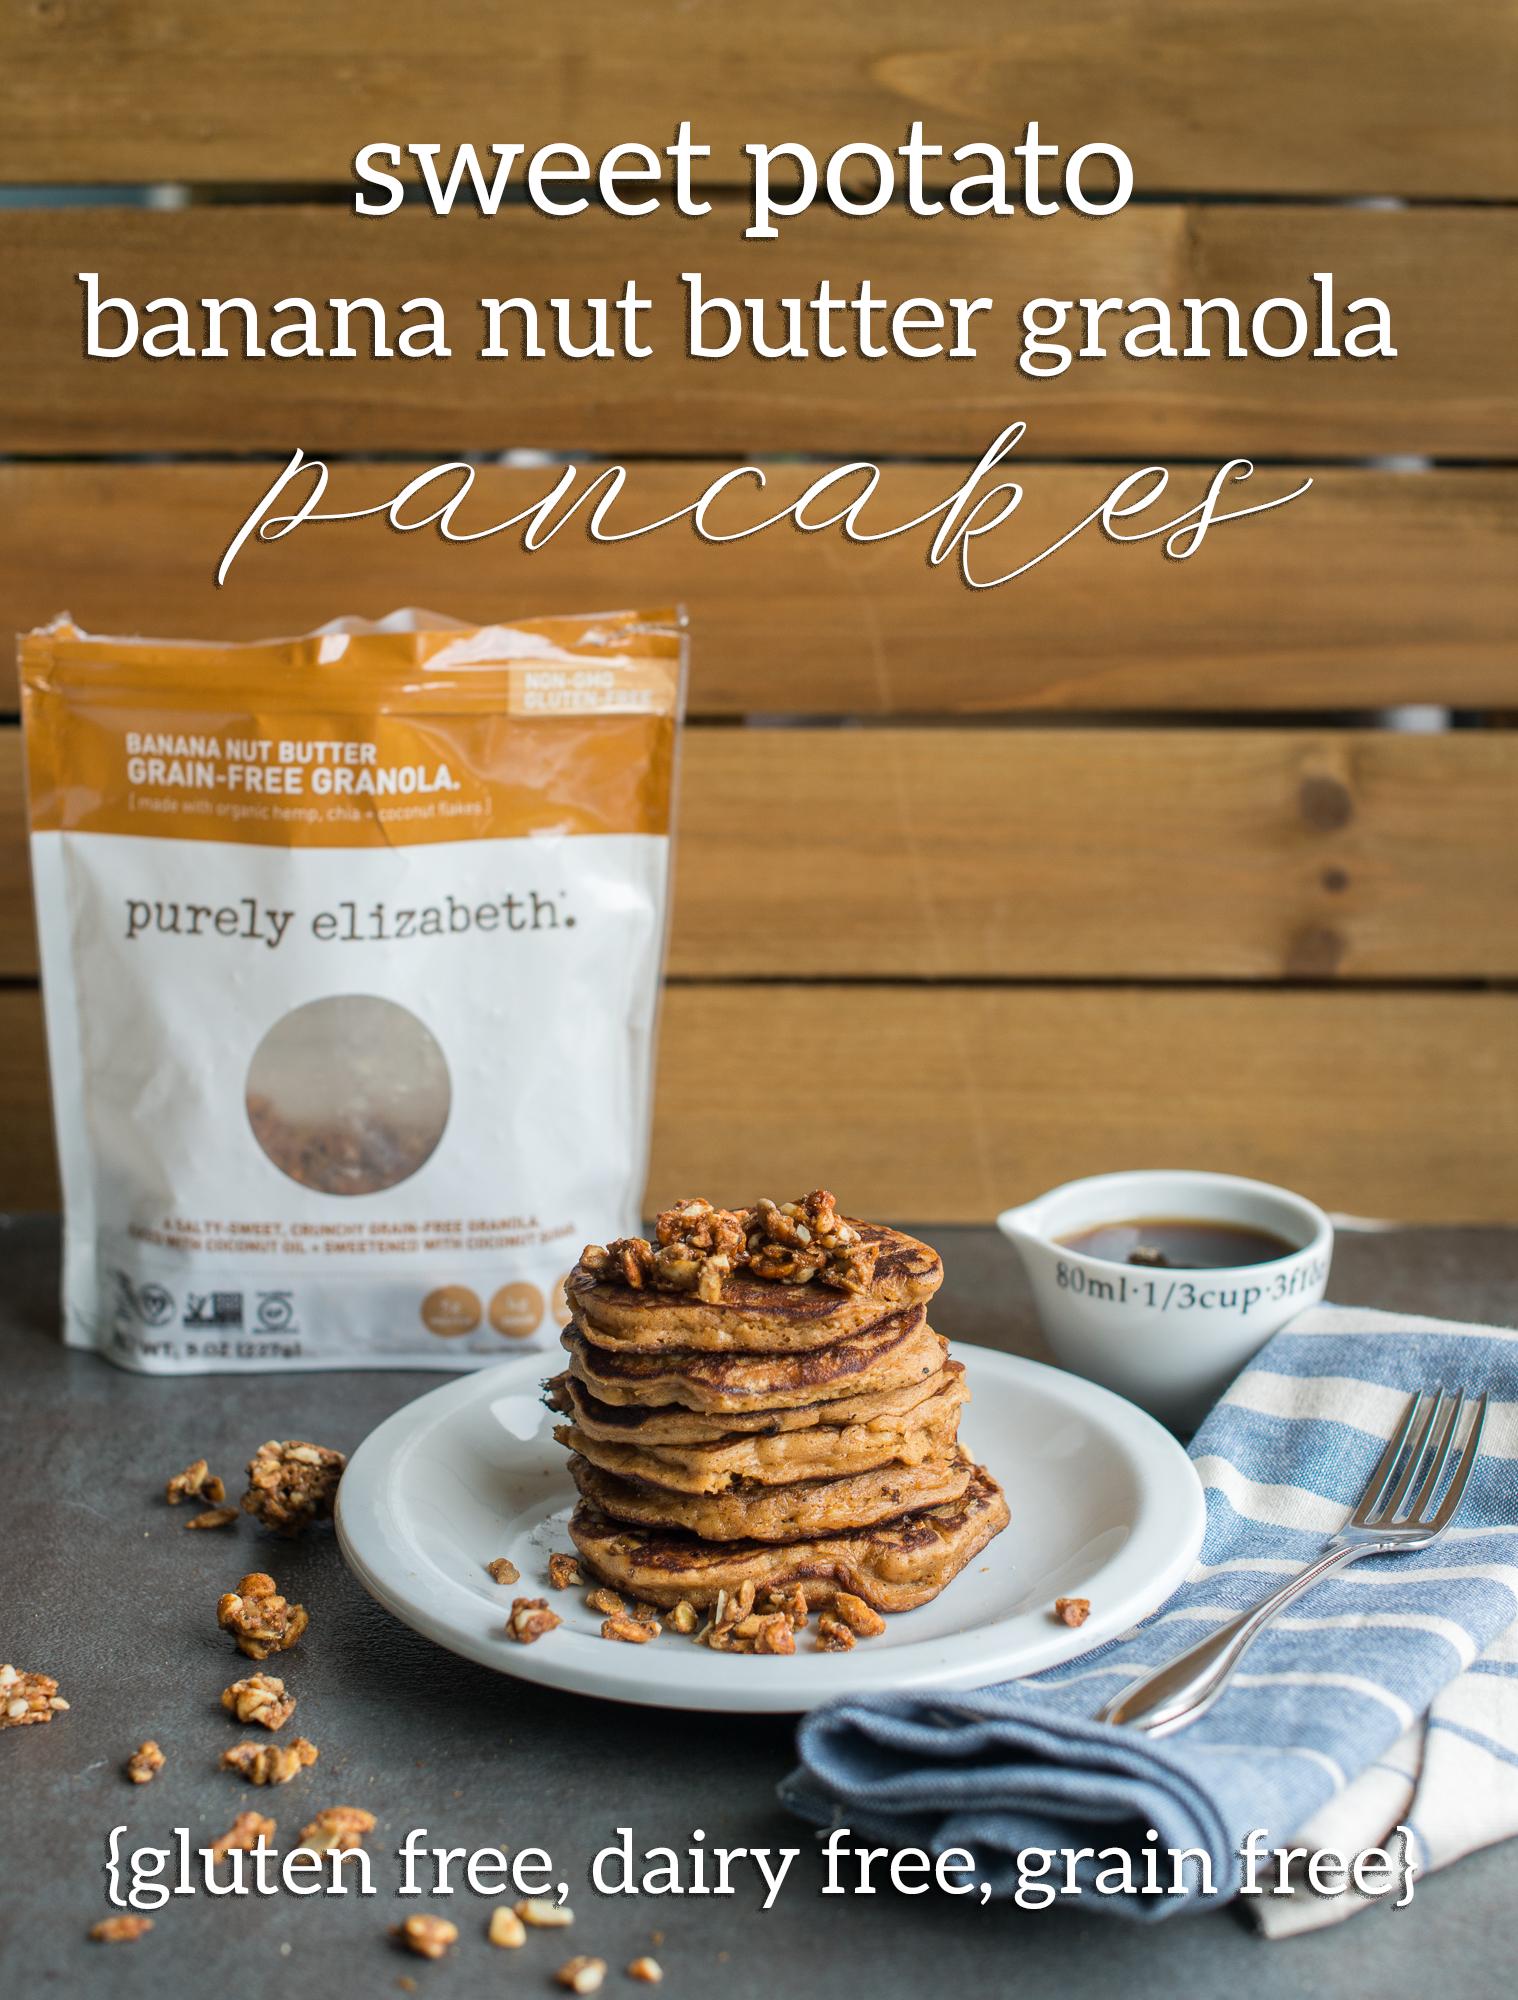 Sweet Potato Pancakes with Grain Free Banana Nut Butter Granola (Gluten Free, Dairy Free, Grain Free)